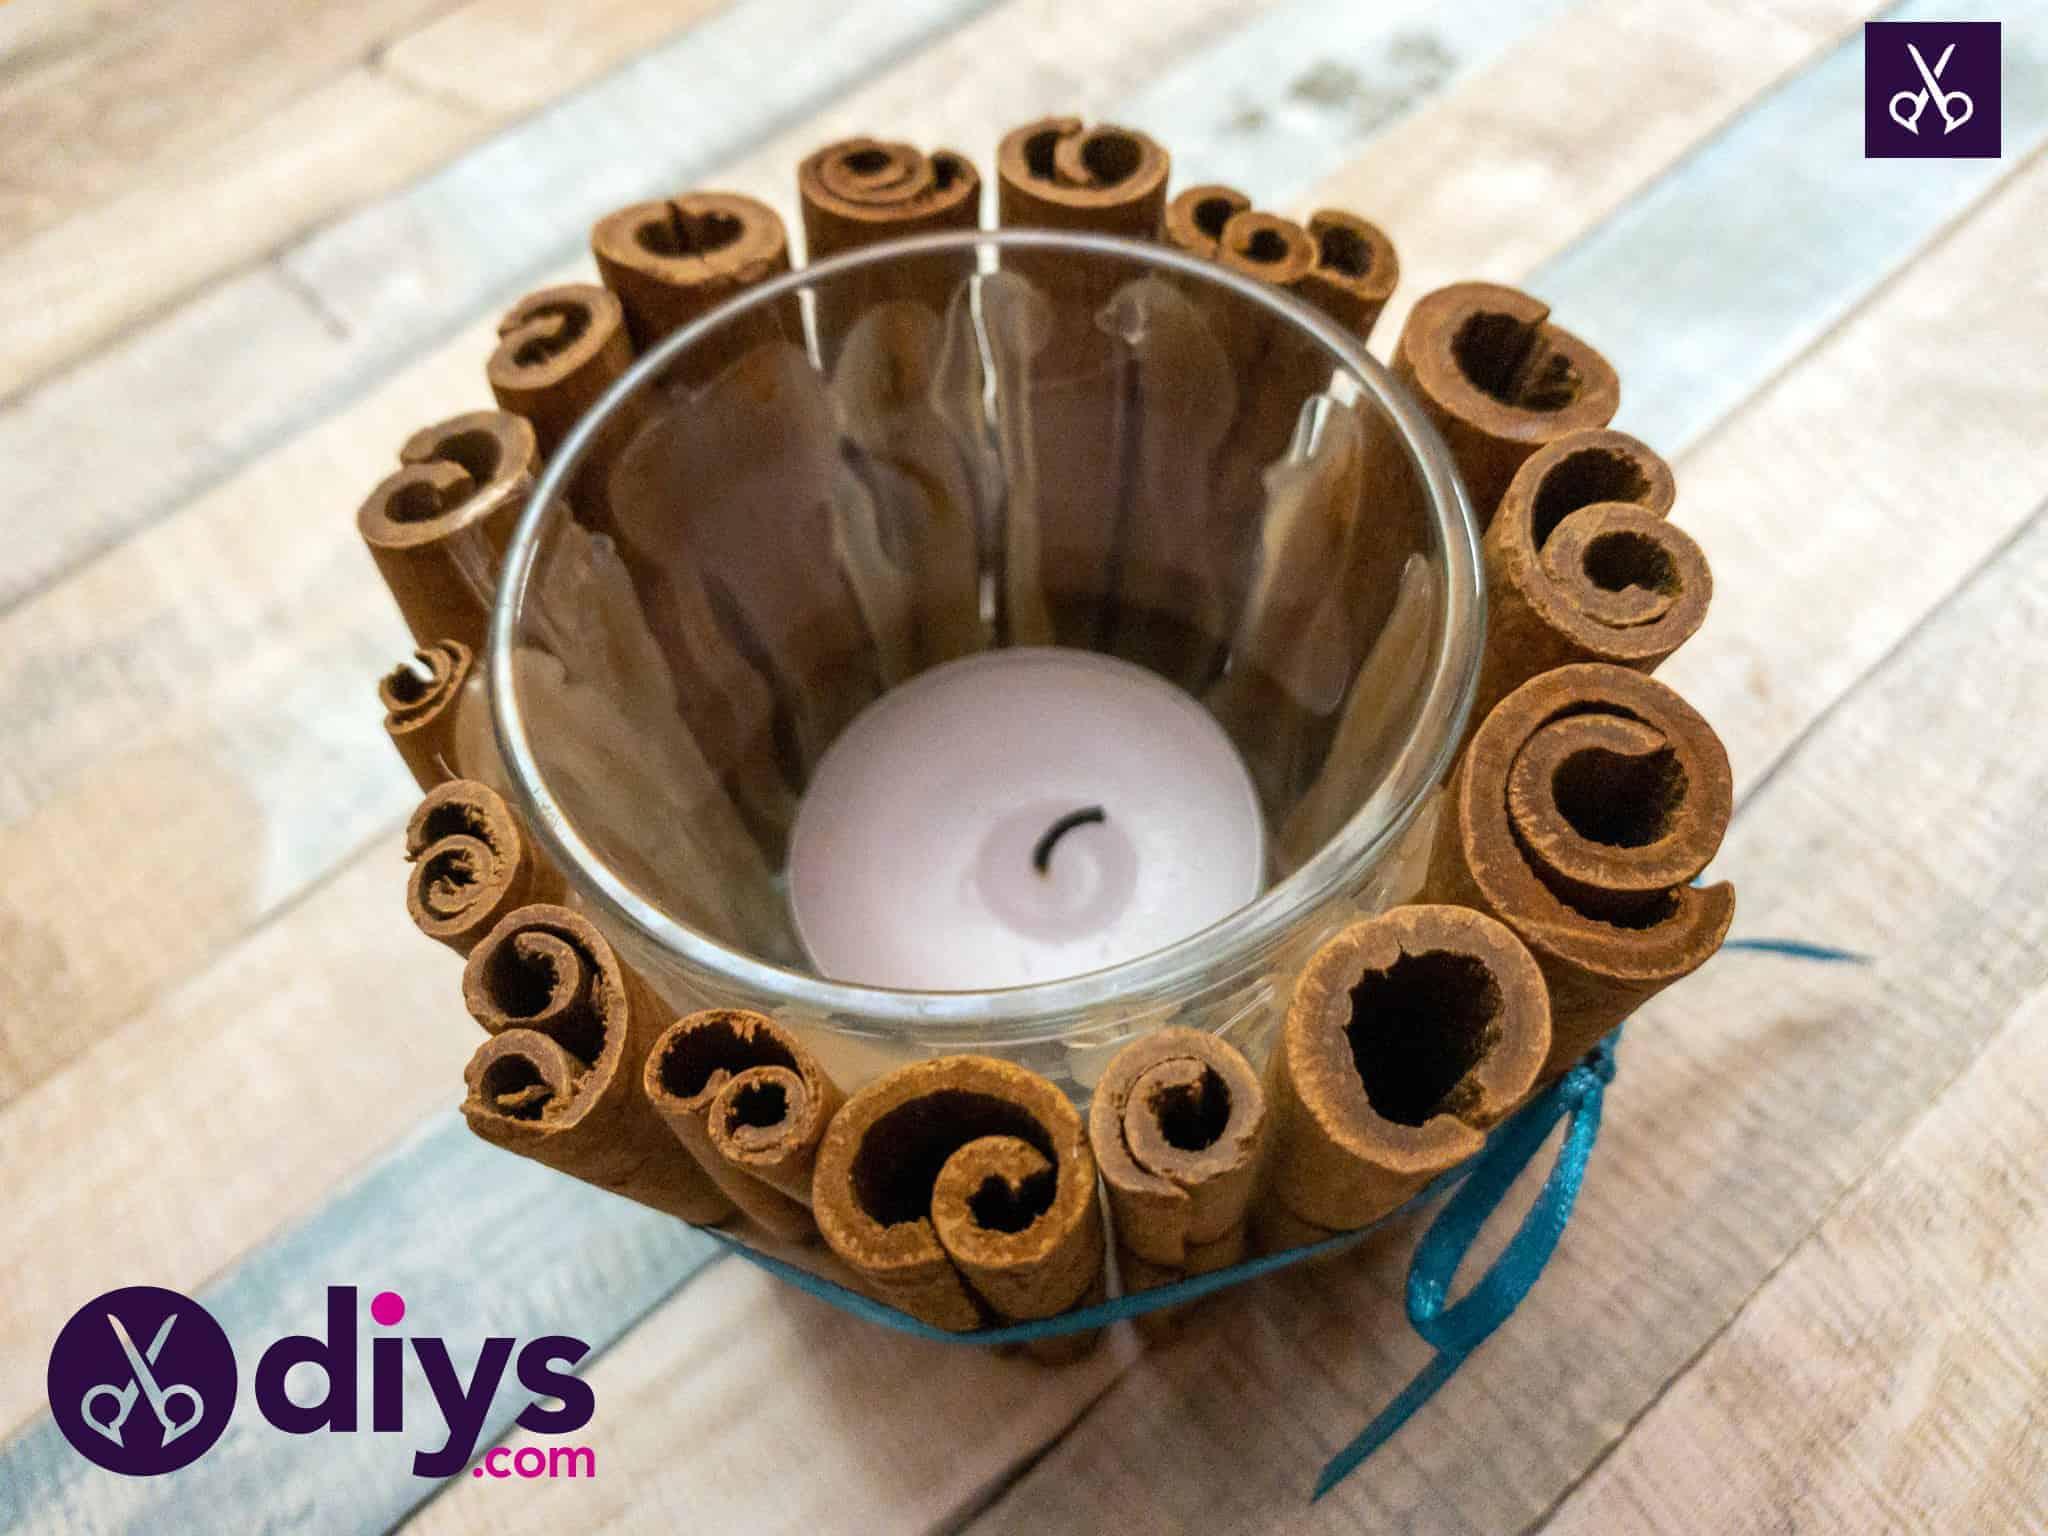 Diy cinnamon stick candle holder